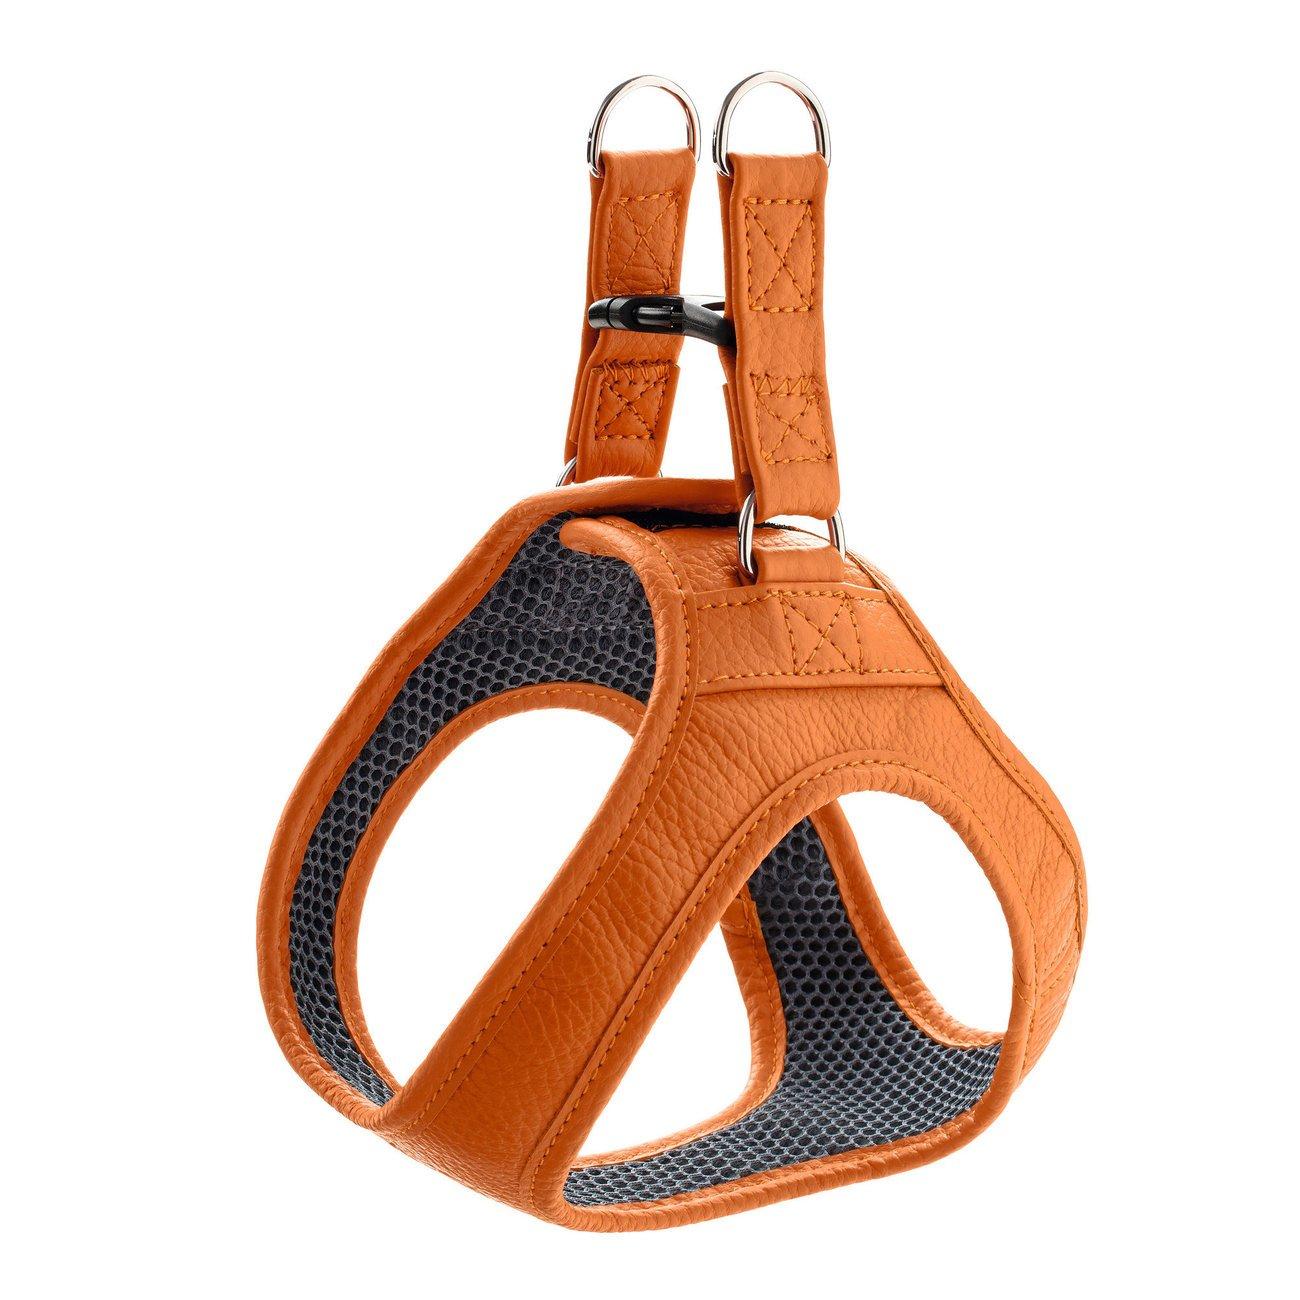 Hunter Hundegeschirr Hilo, Gr. XXS - XS: 30 - 34 cm Verstellmöglichkeit Hals, 32 - 36 cm Verstellmöglichkeit Bauch, orange